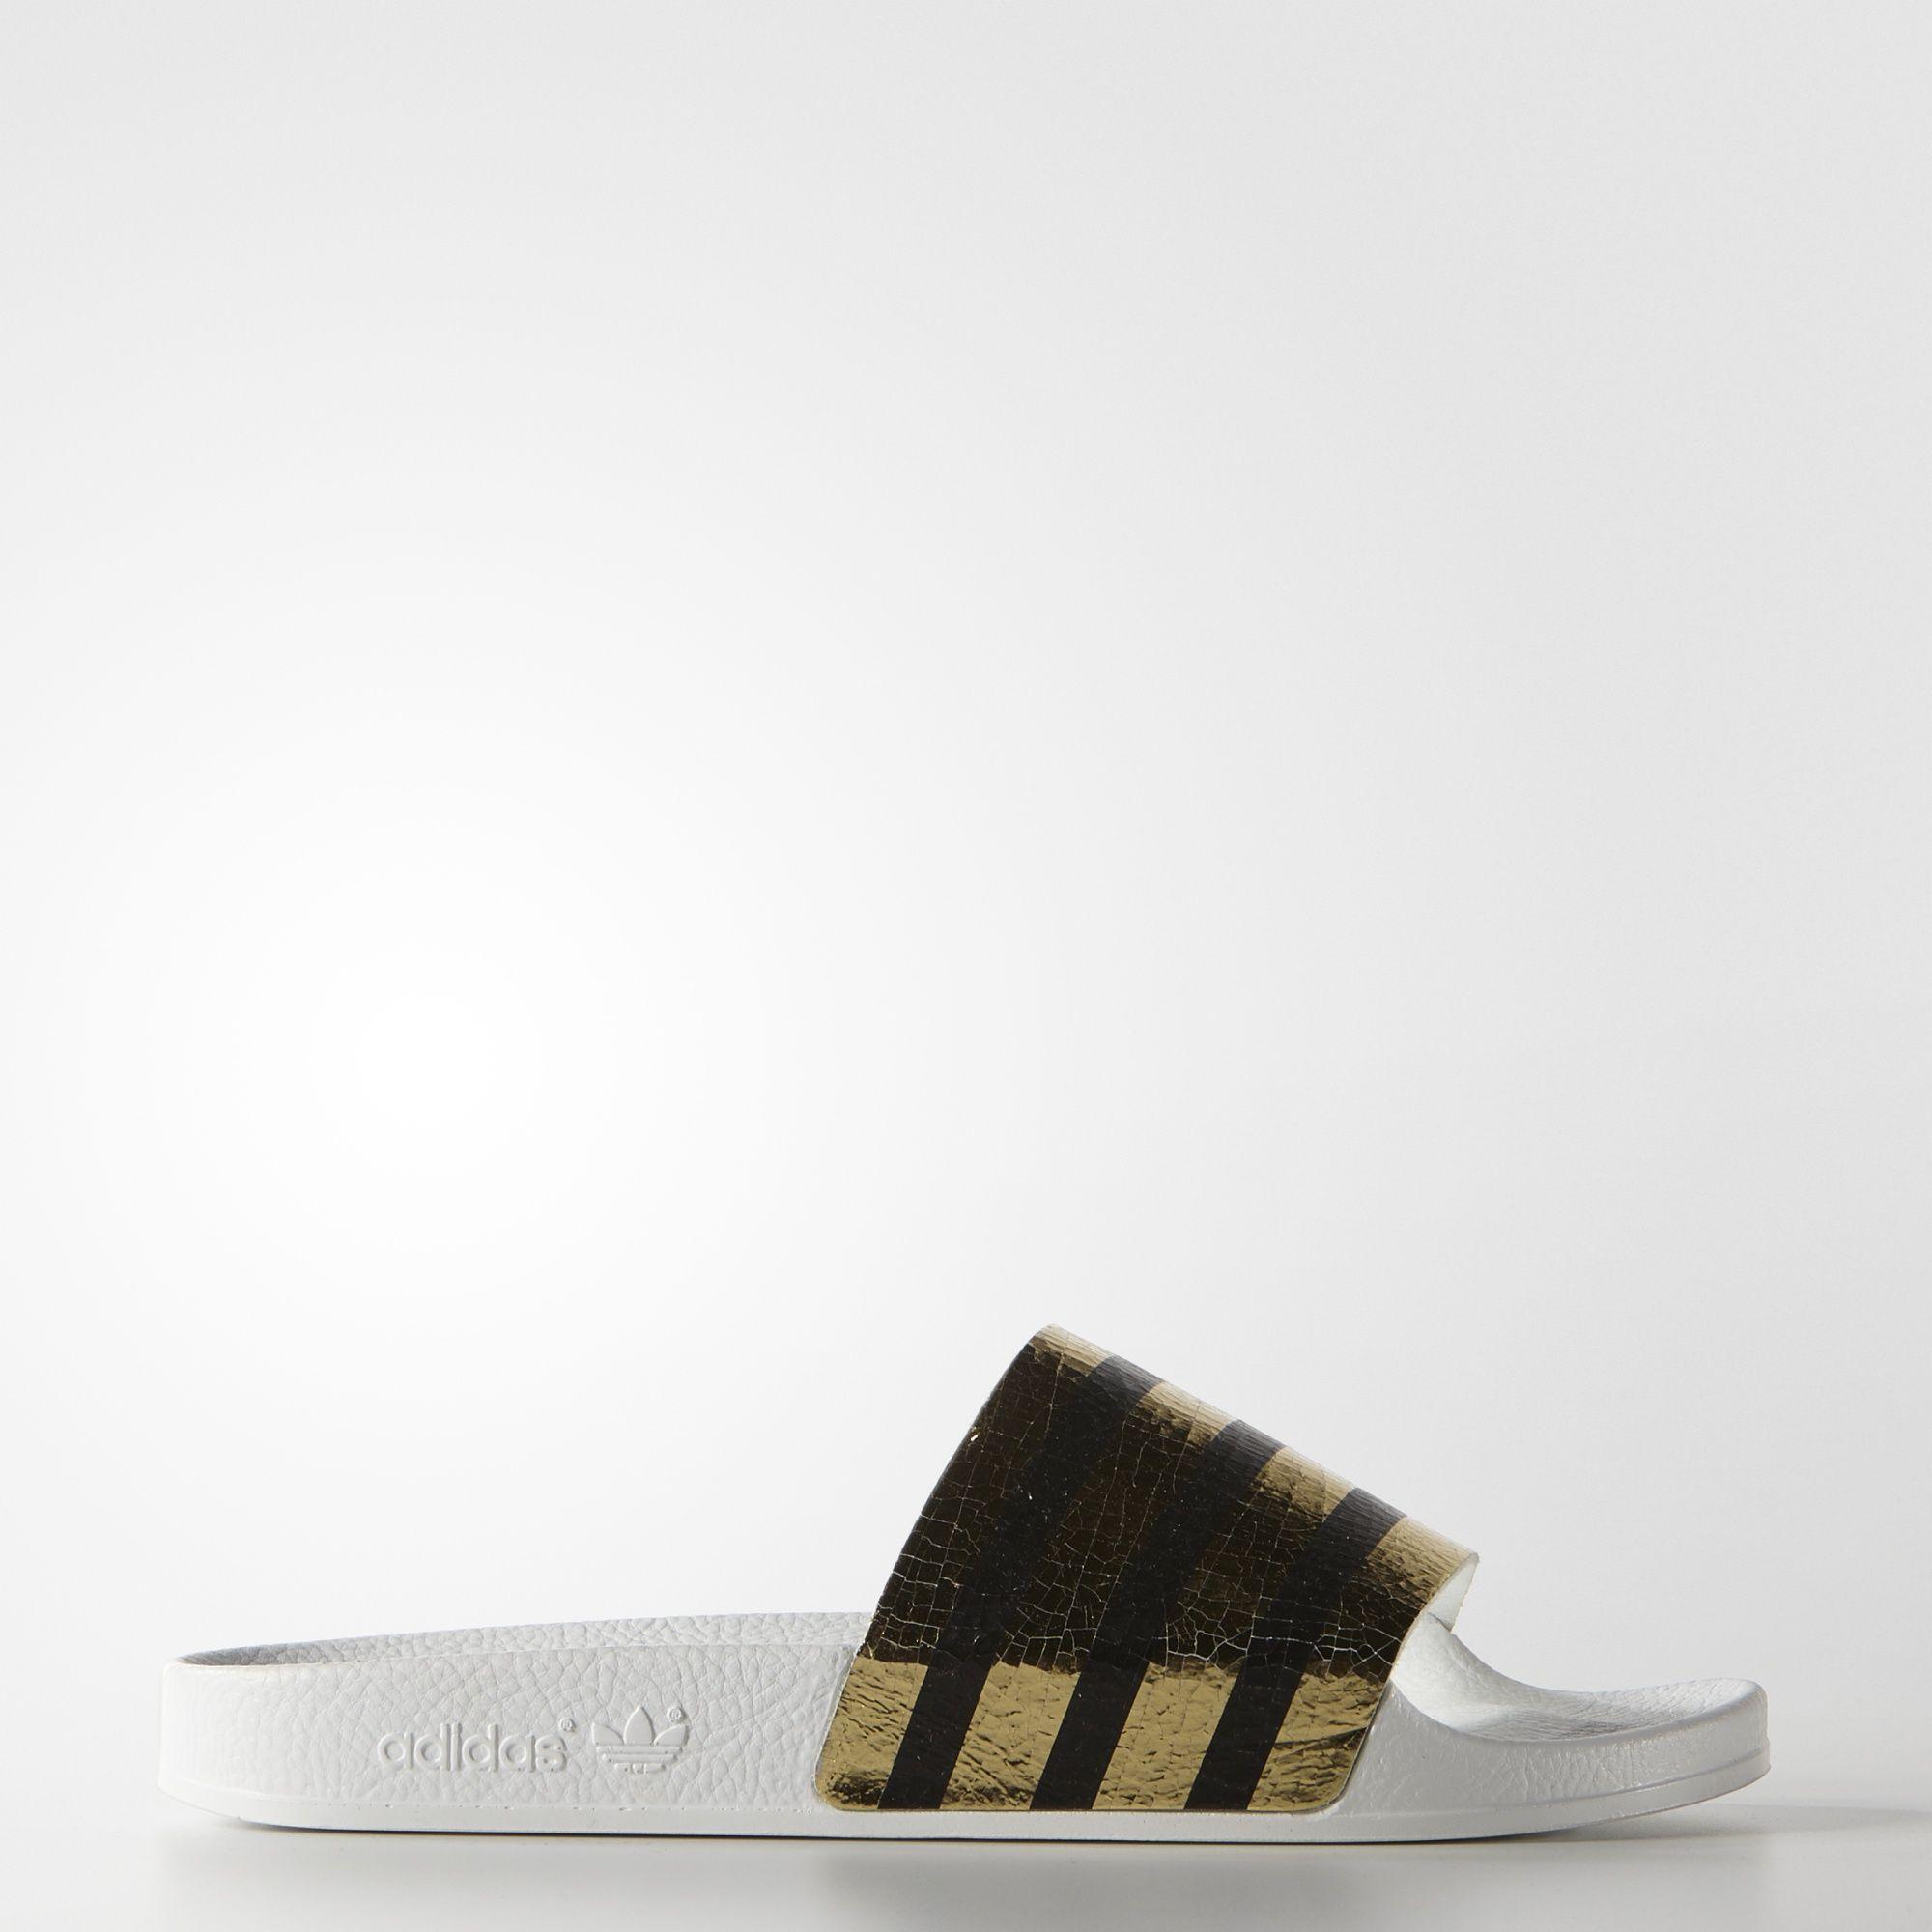 adidas adilette limited edition